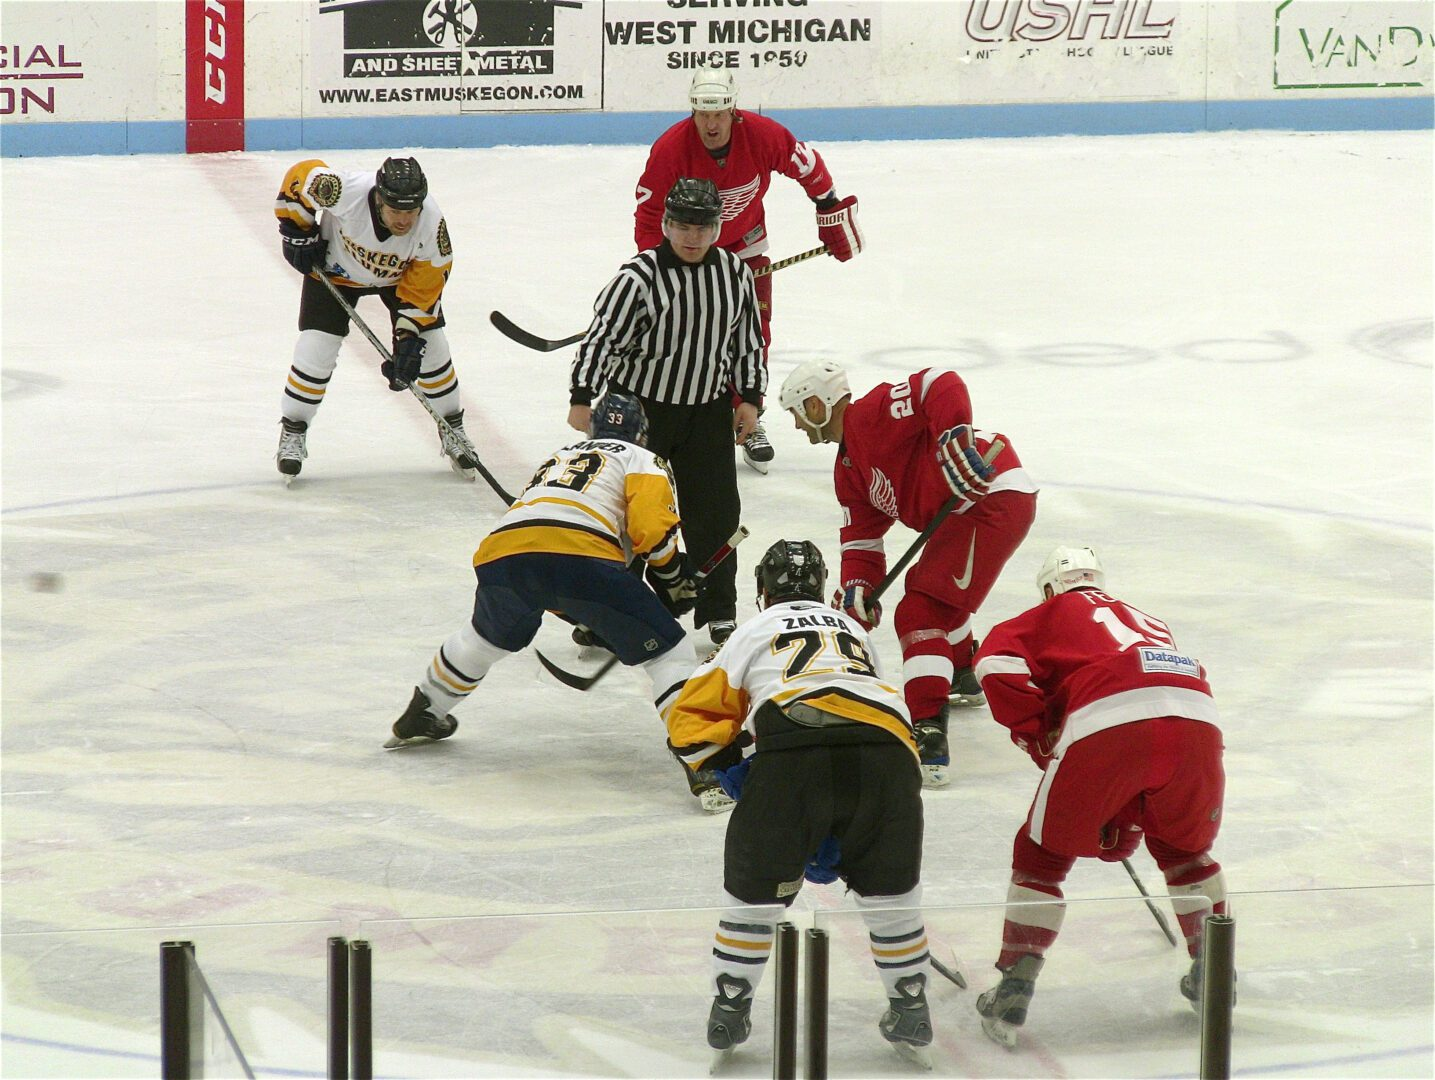 Detroit Red Wings skate by Muskegon Lumberjacks in alumni game at L.C. Walker Arena